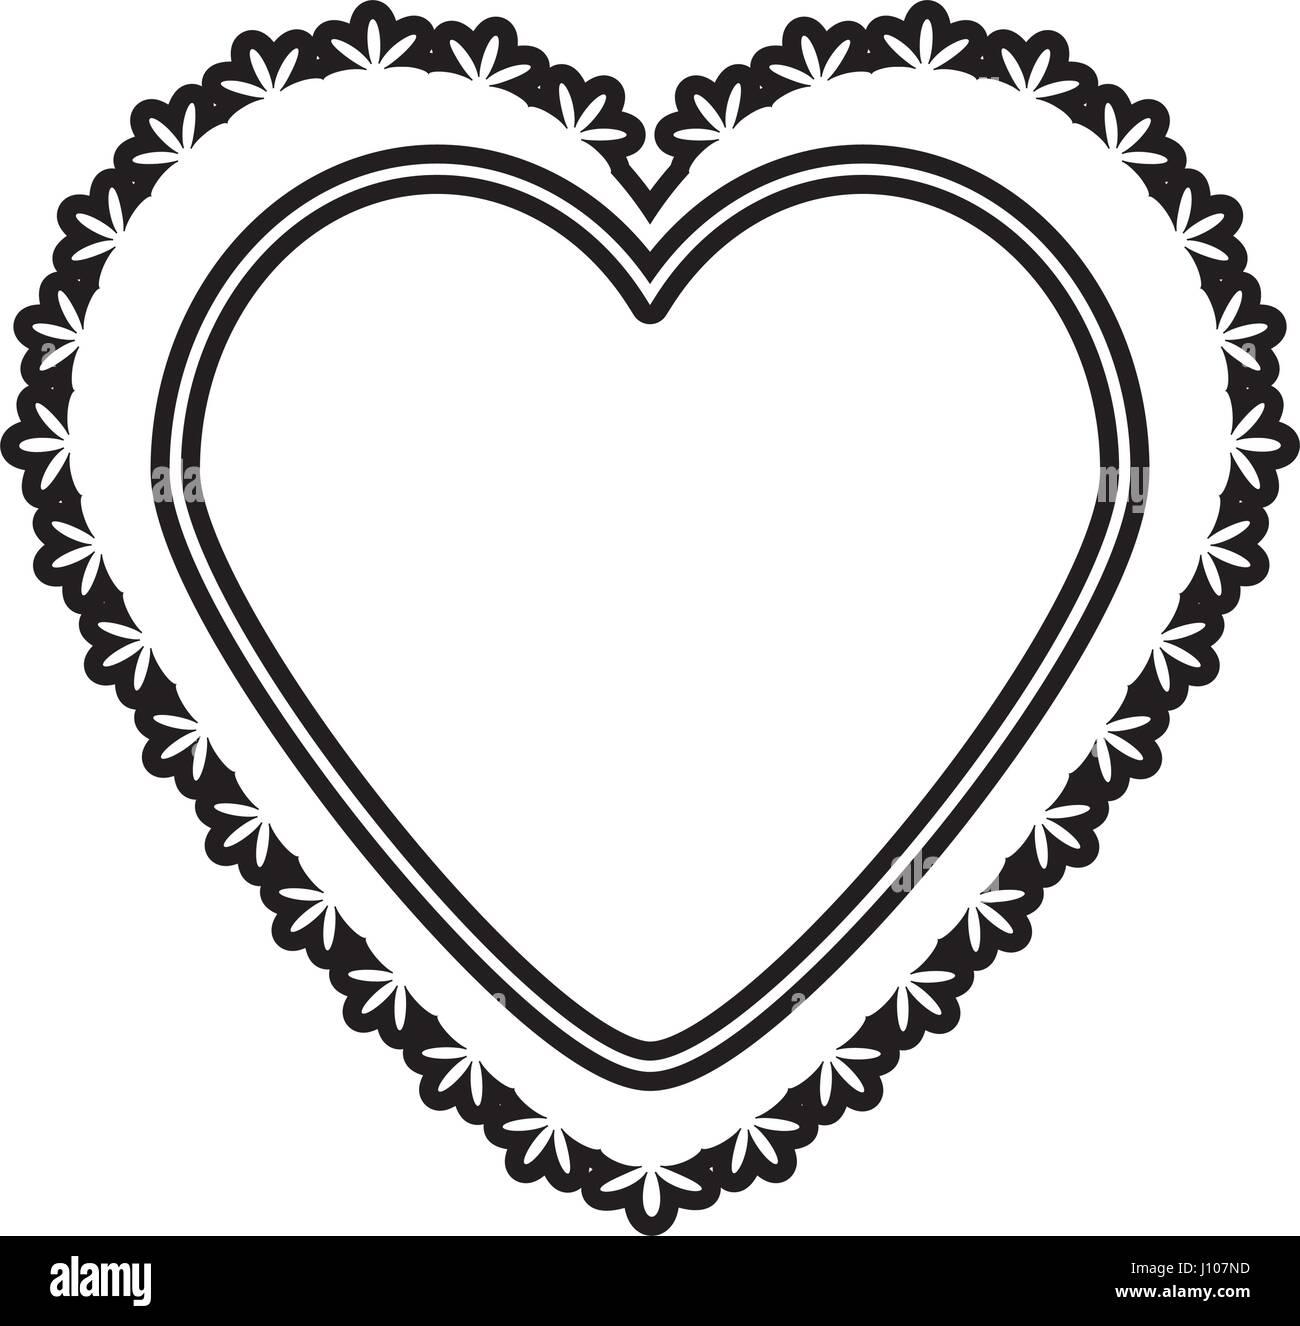 Romantic heart decoration image outline stock vector art romantic heart decoration image outline buycottarizona Image collections